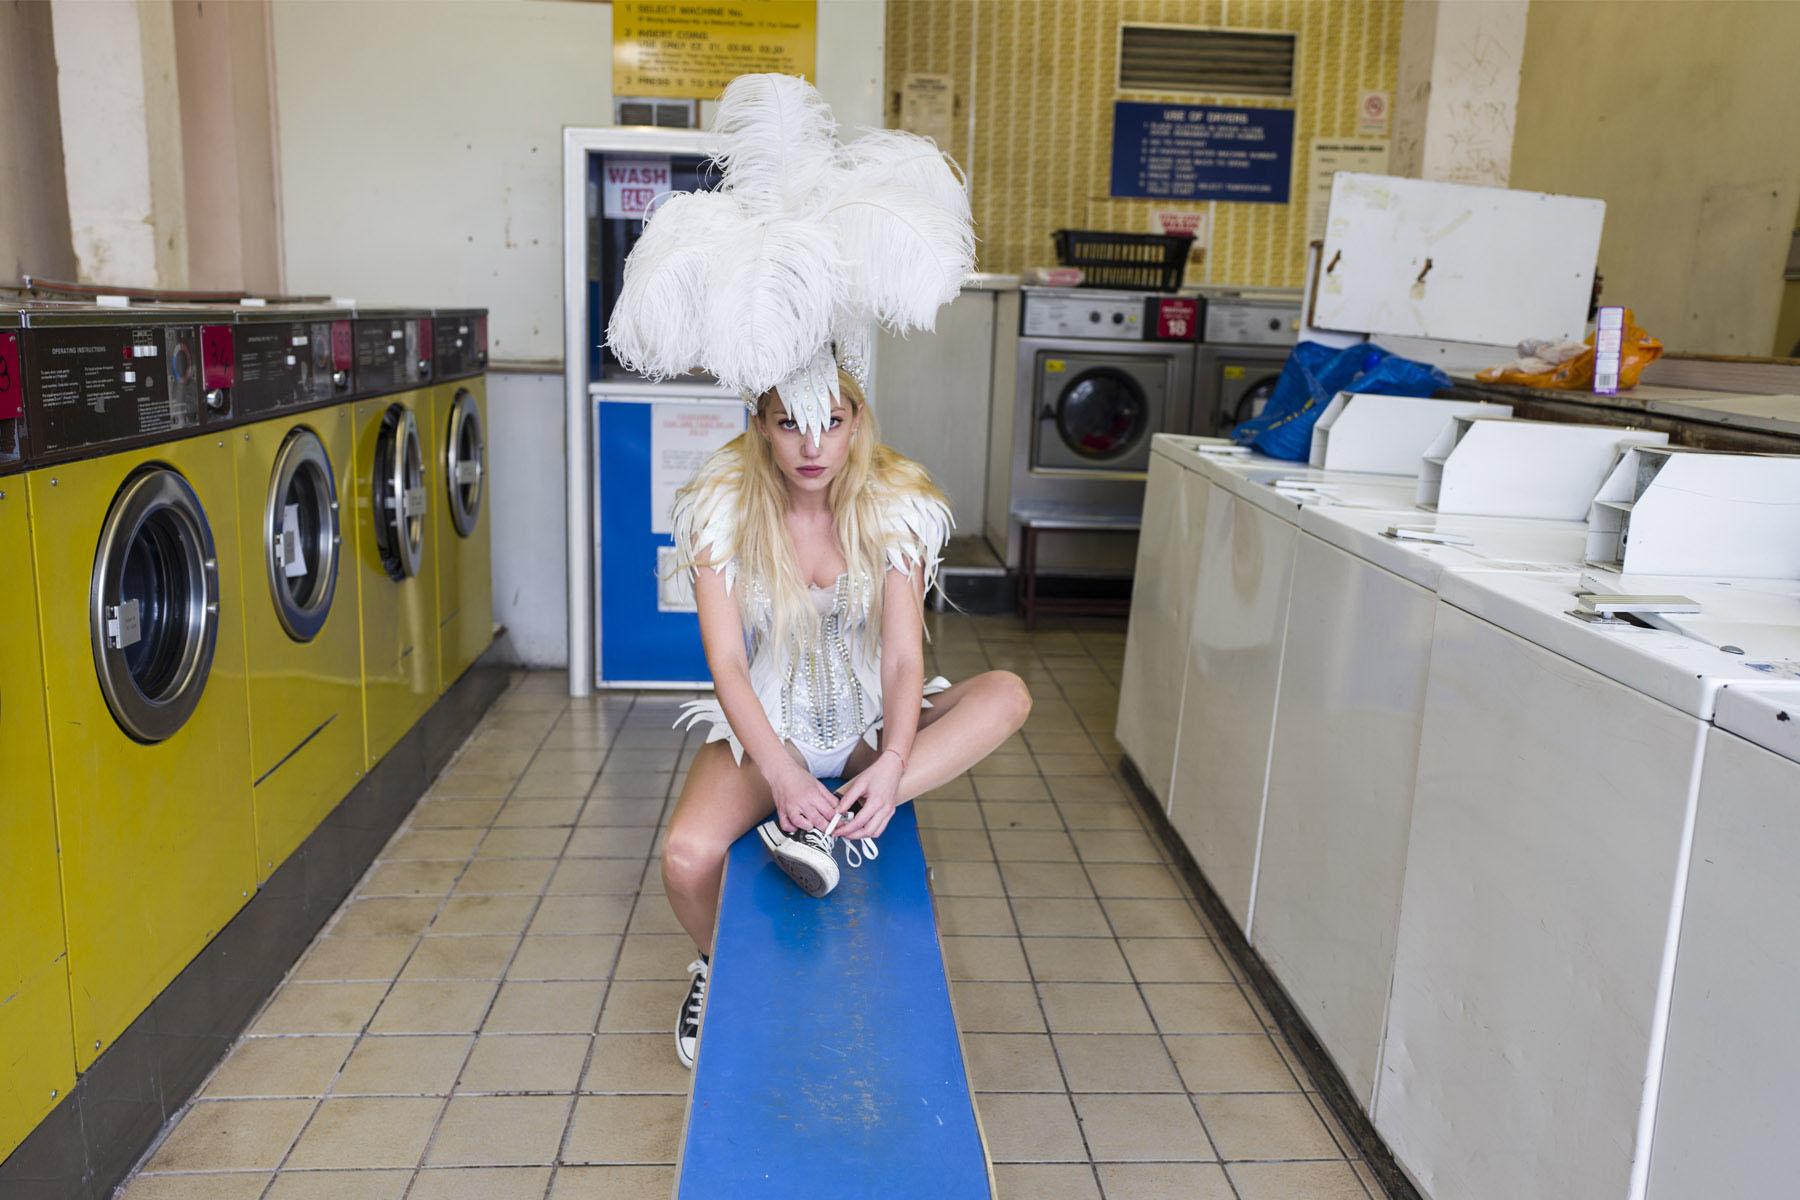 laundrette fashion   aniphotography.com